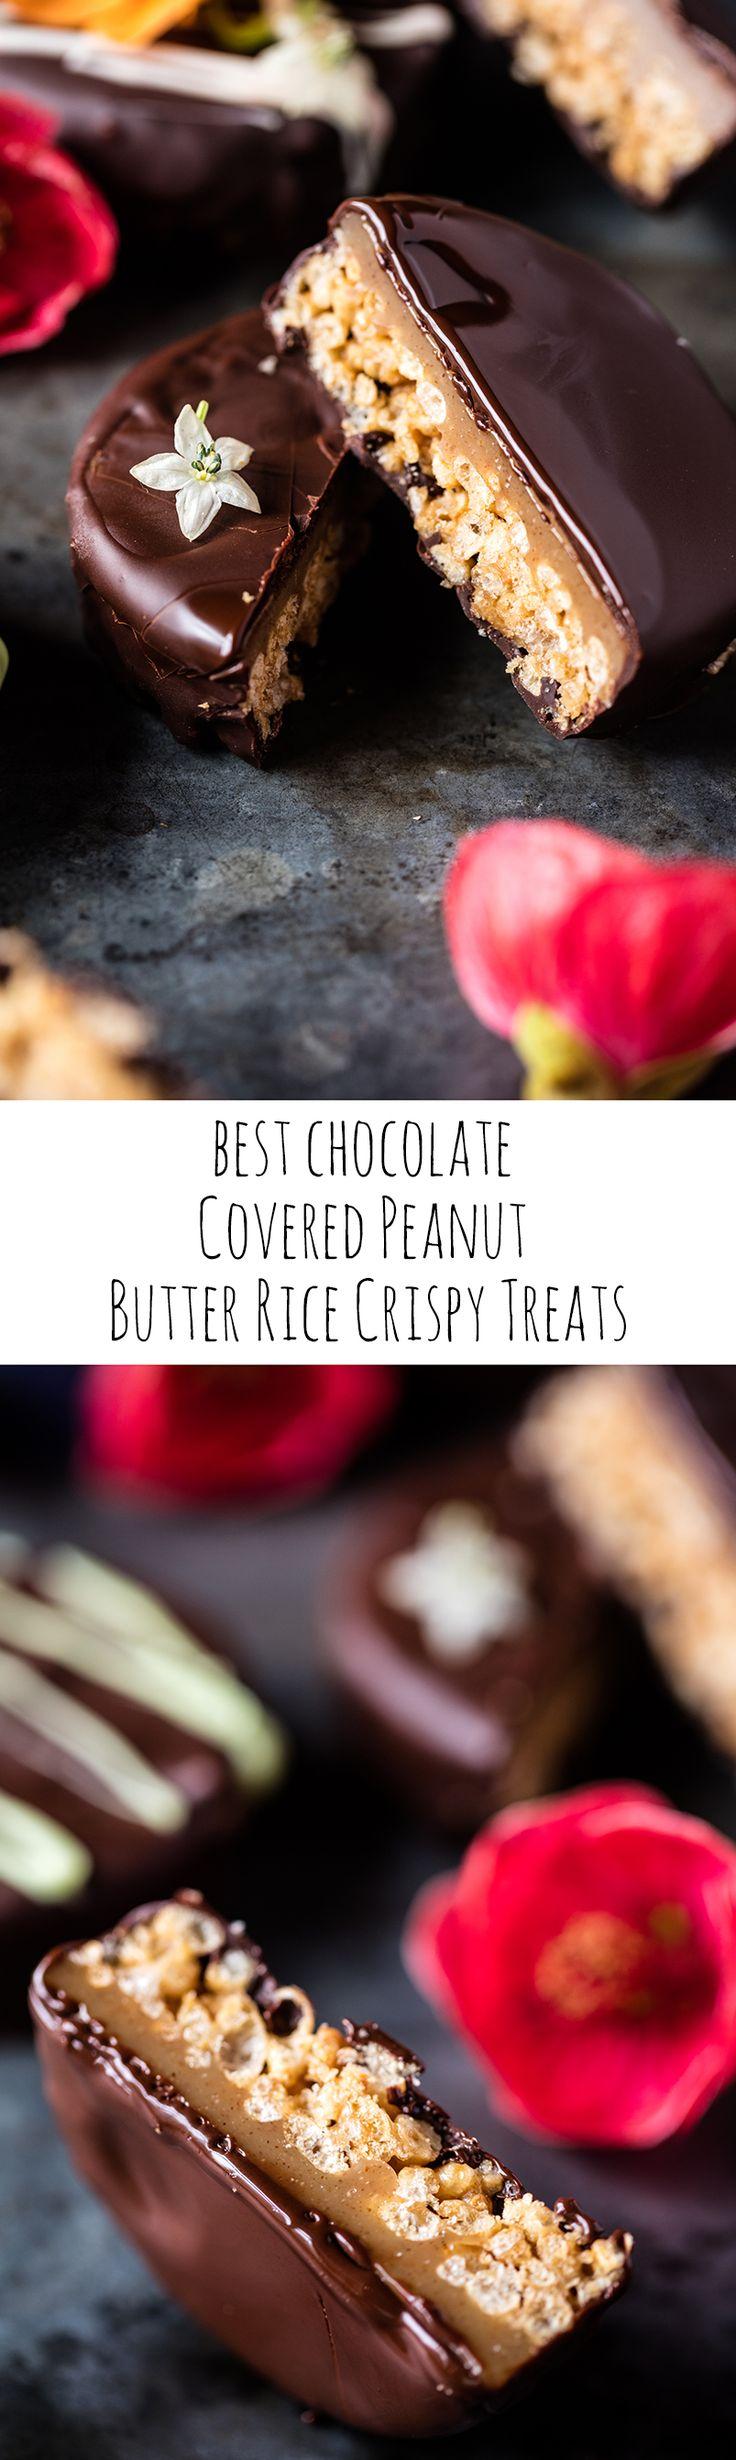 Best Chocolate Covered Peanut Butter Rice Crispy Treats   halfbakedharvest.com @hbharvest